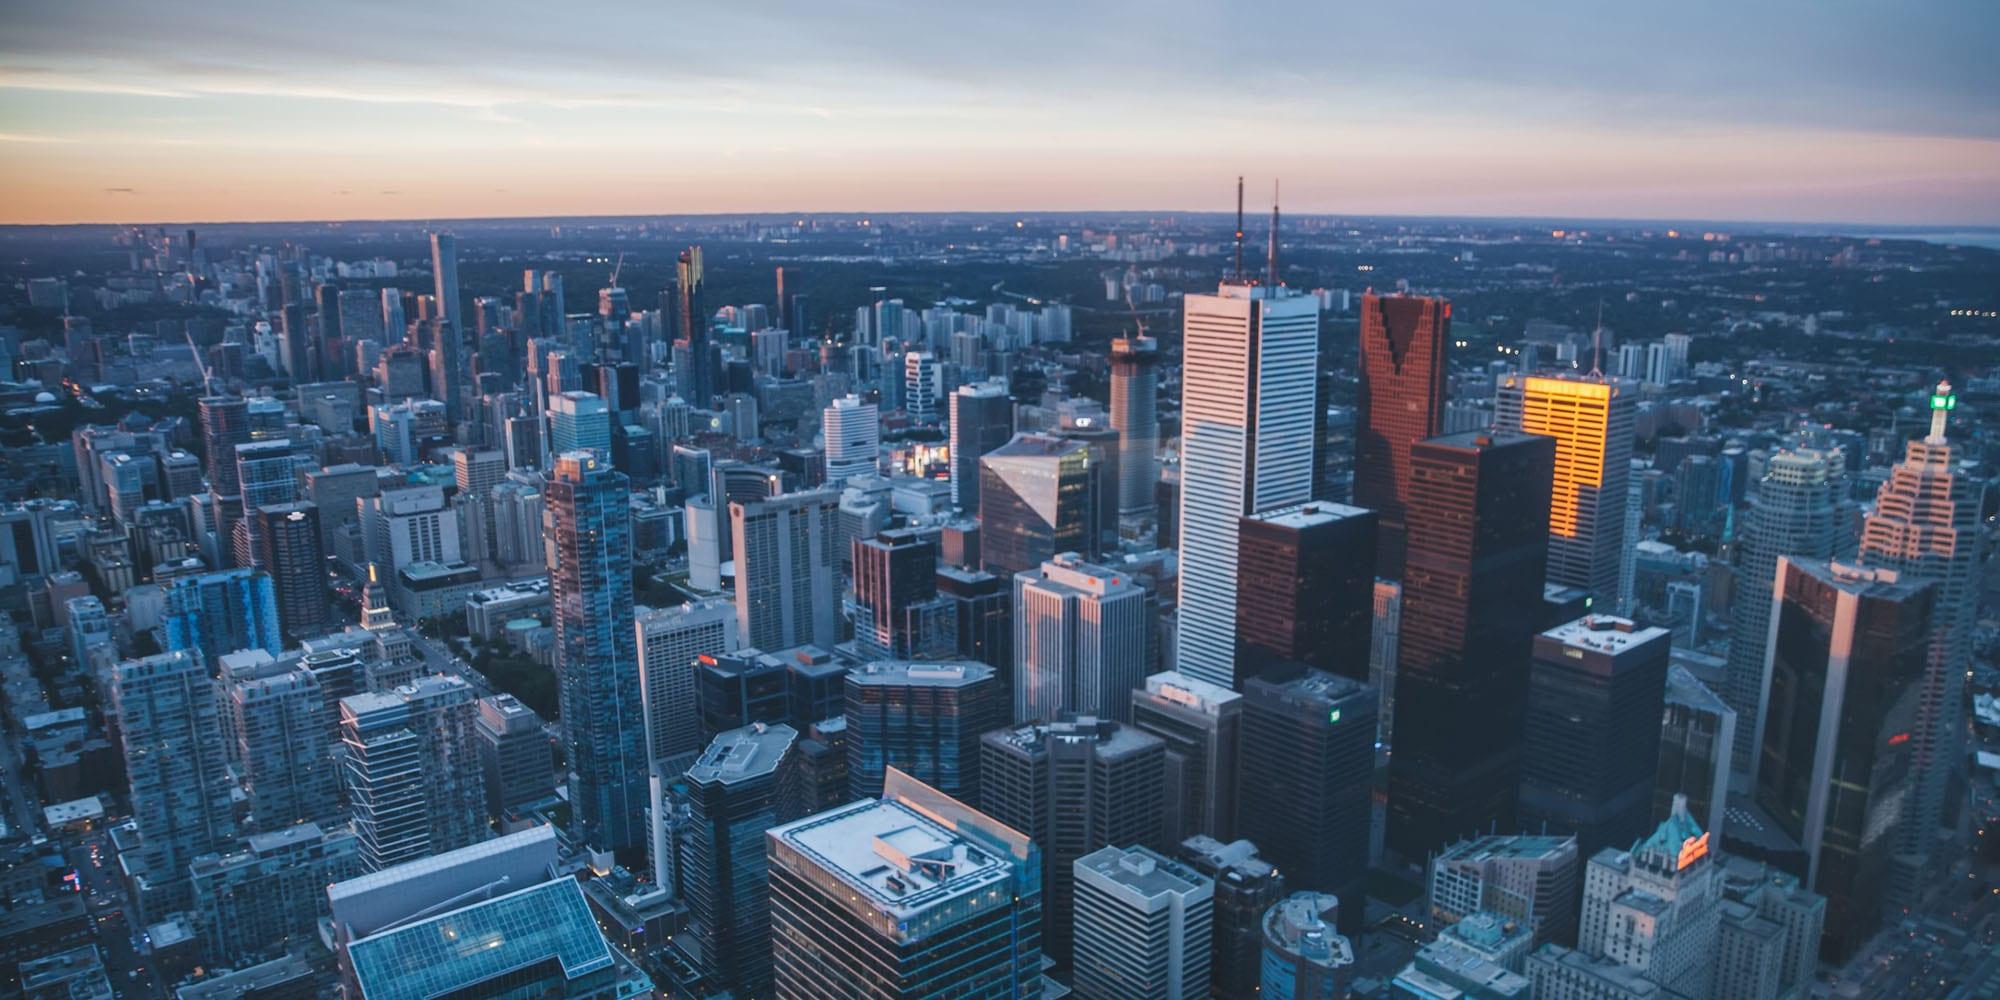 6 ways Canada can build a stronger tech sector